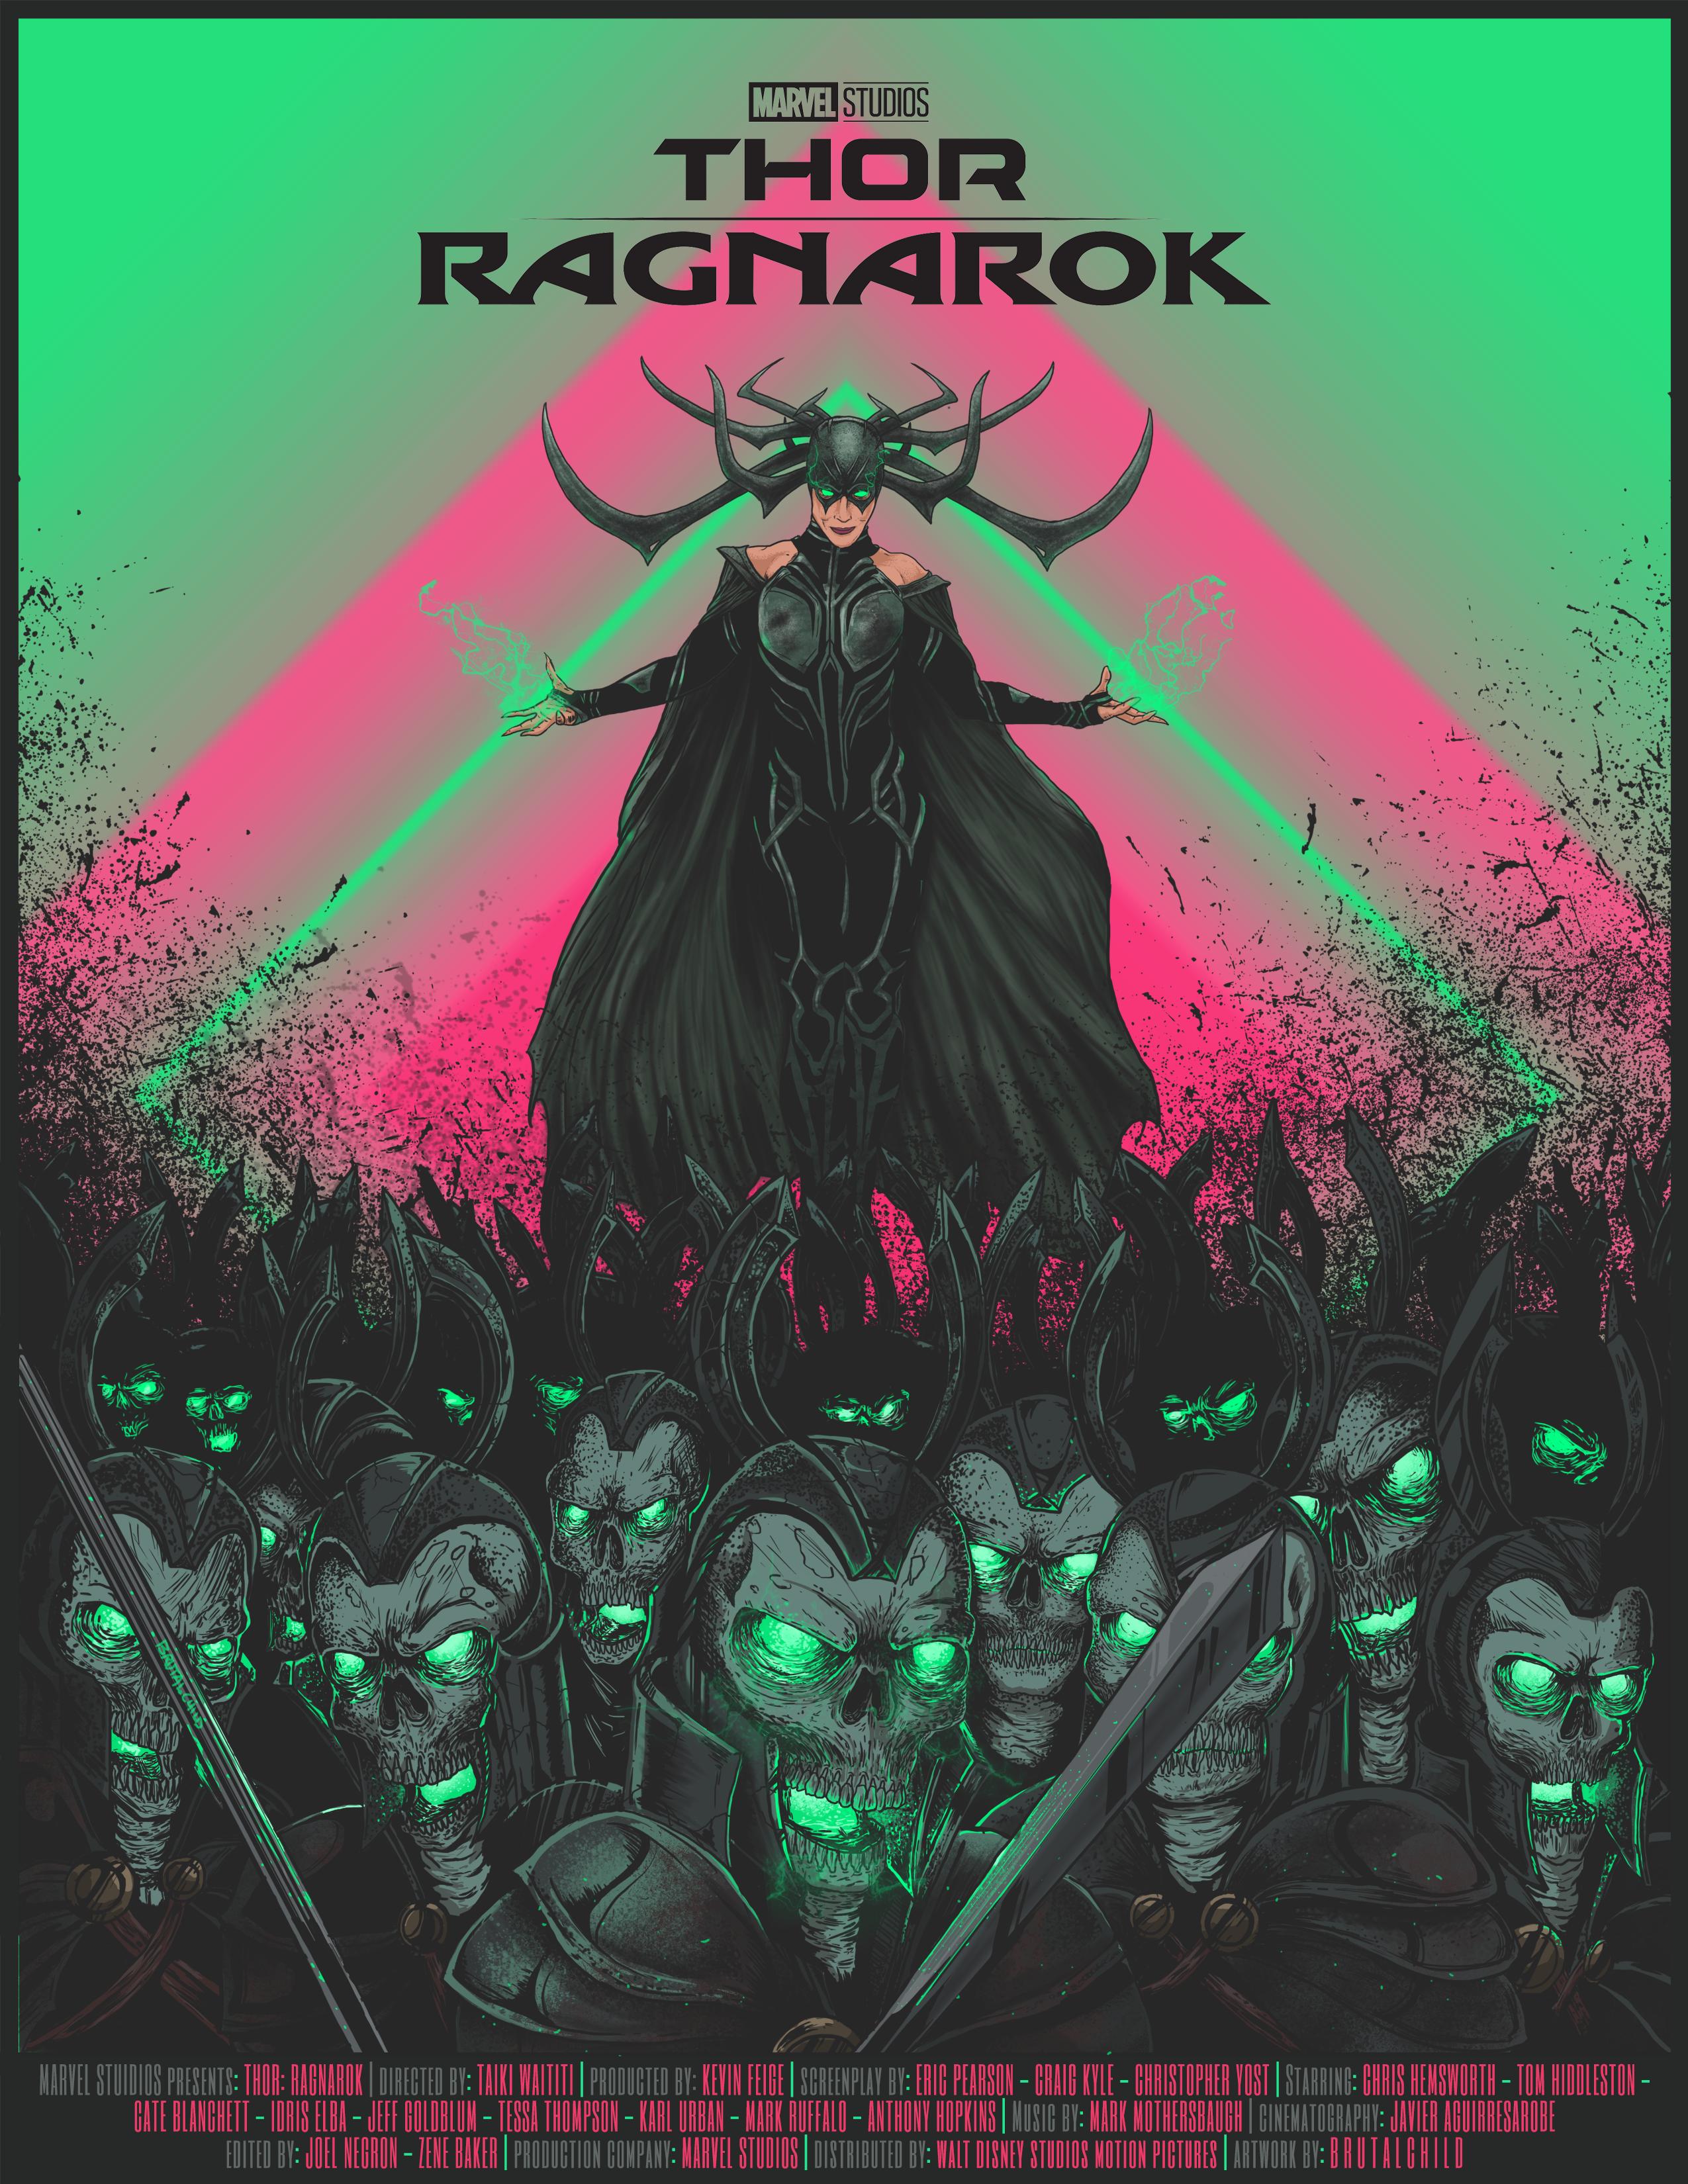 Thor Ragnarok 2017 Director Taika Waititi Productora Marvel Knights Marvel Studios Walt Disney Pictures Escritor Eric P Poster Best Movie Posters Thor